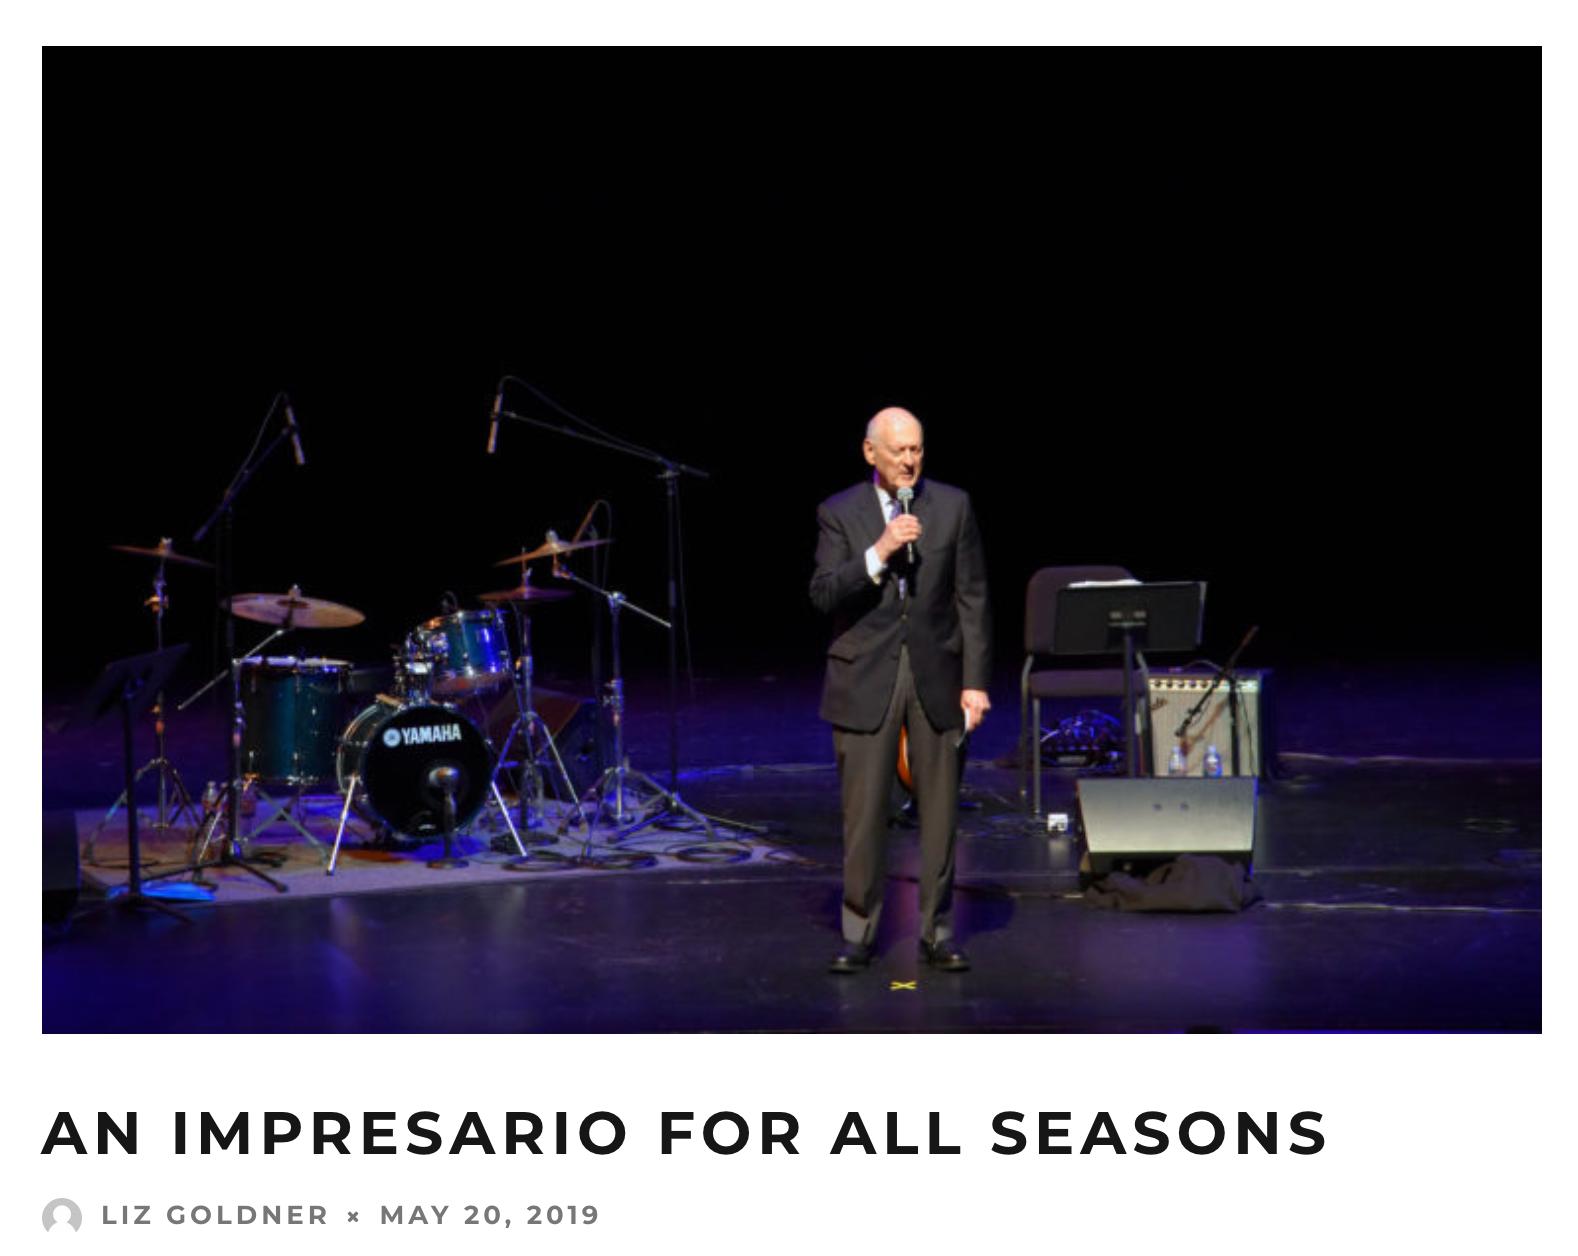 An Impressario for All Seasons